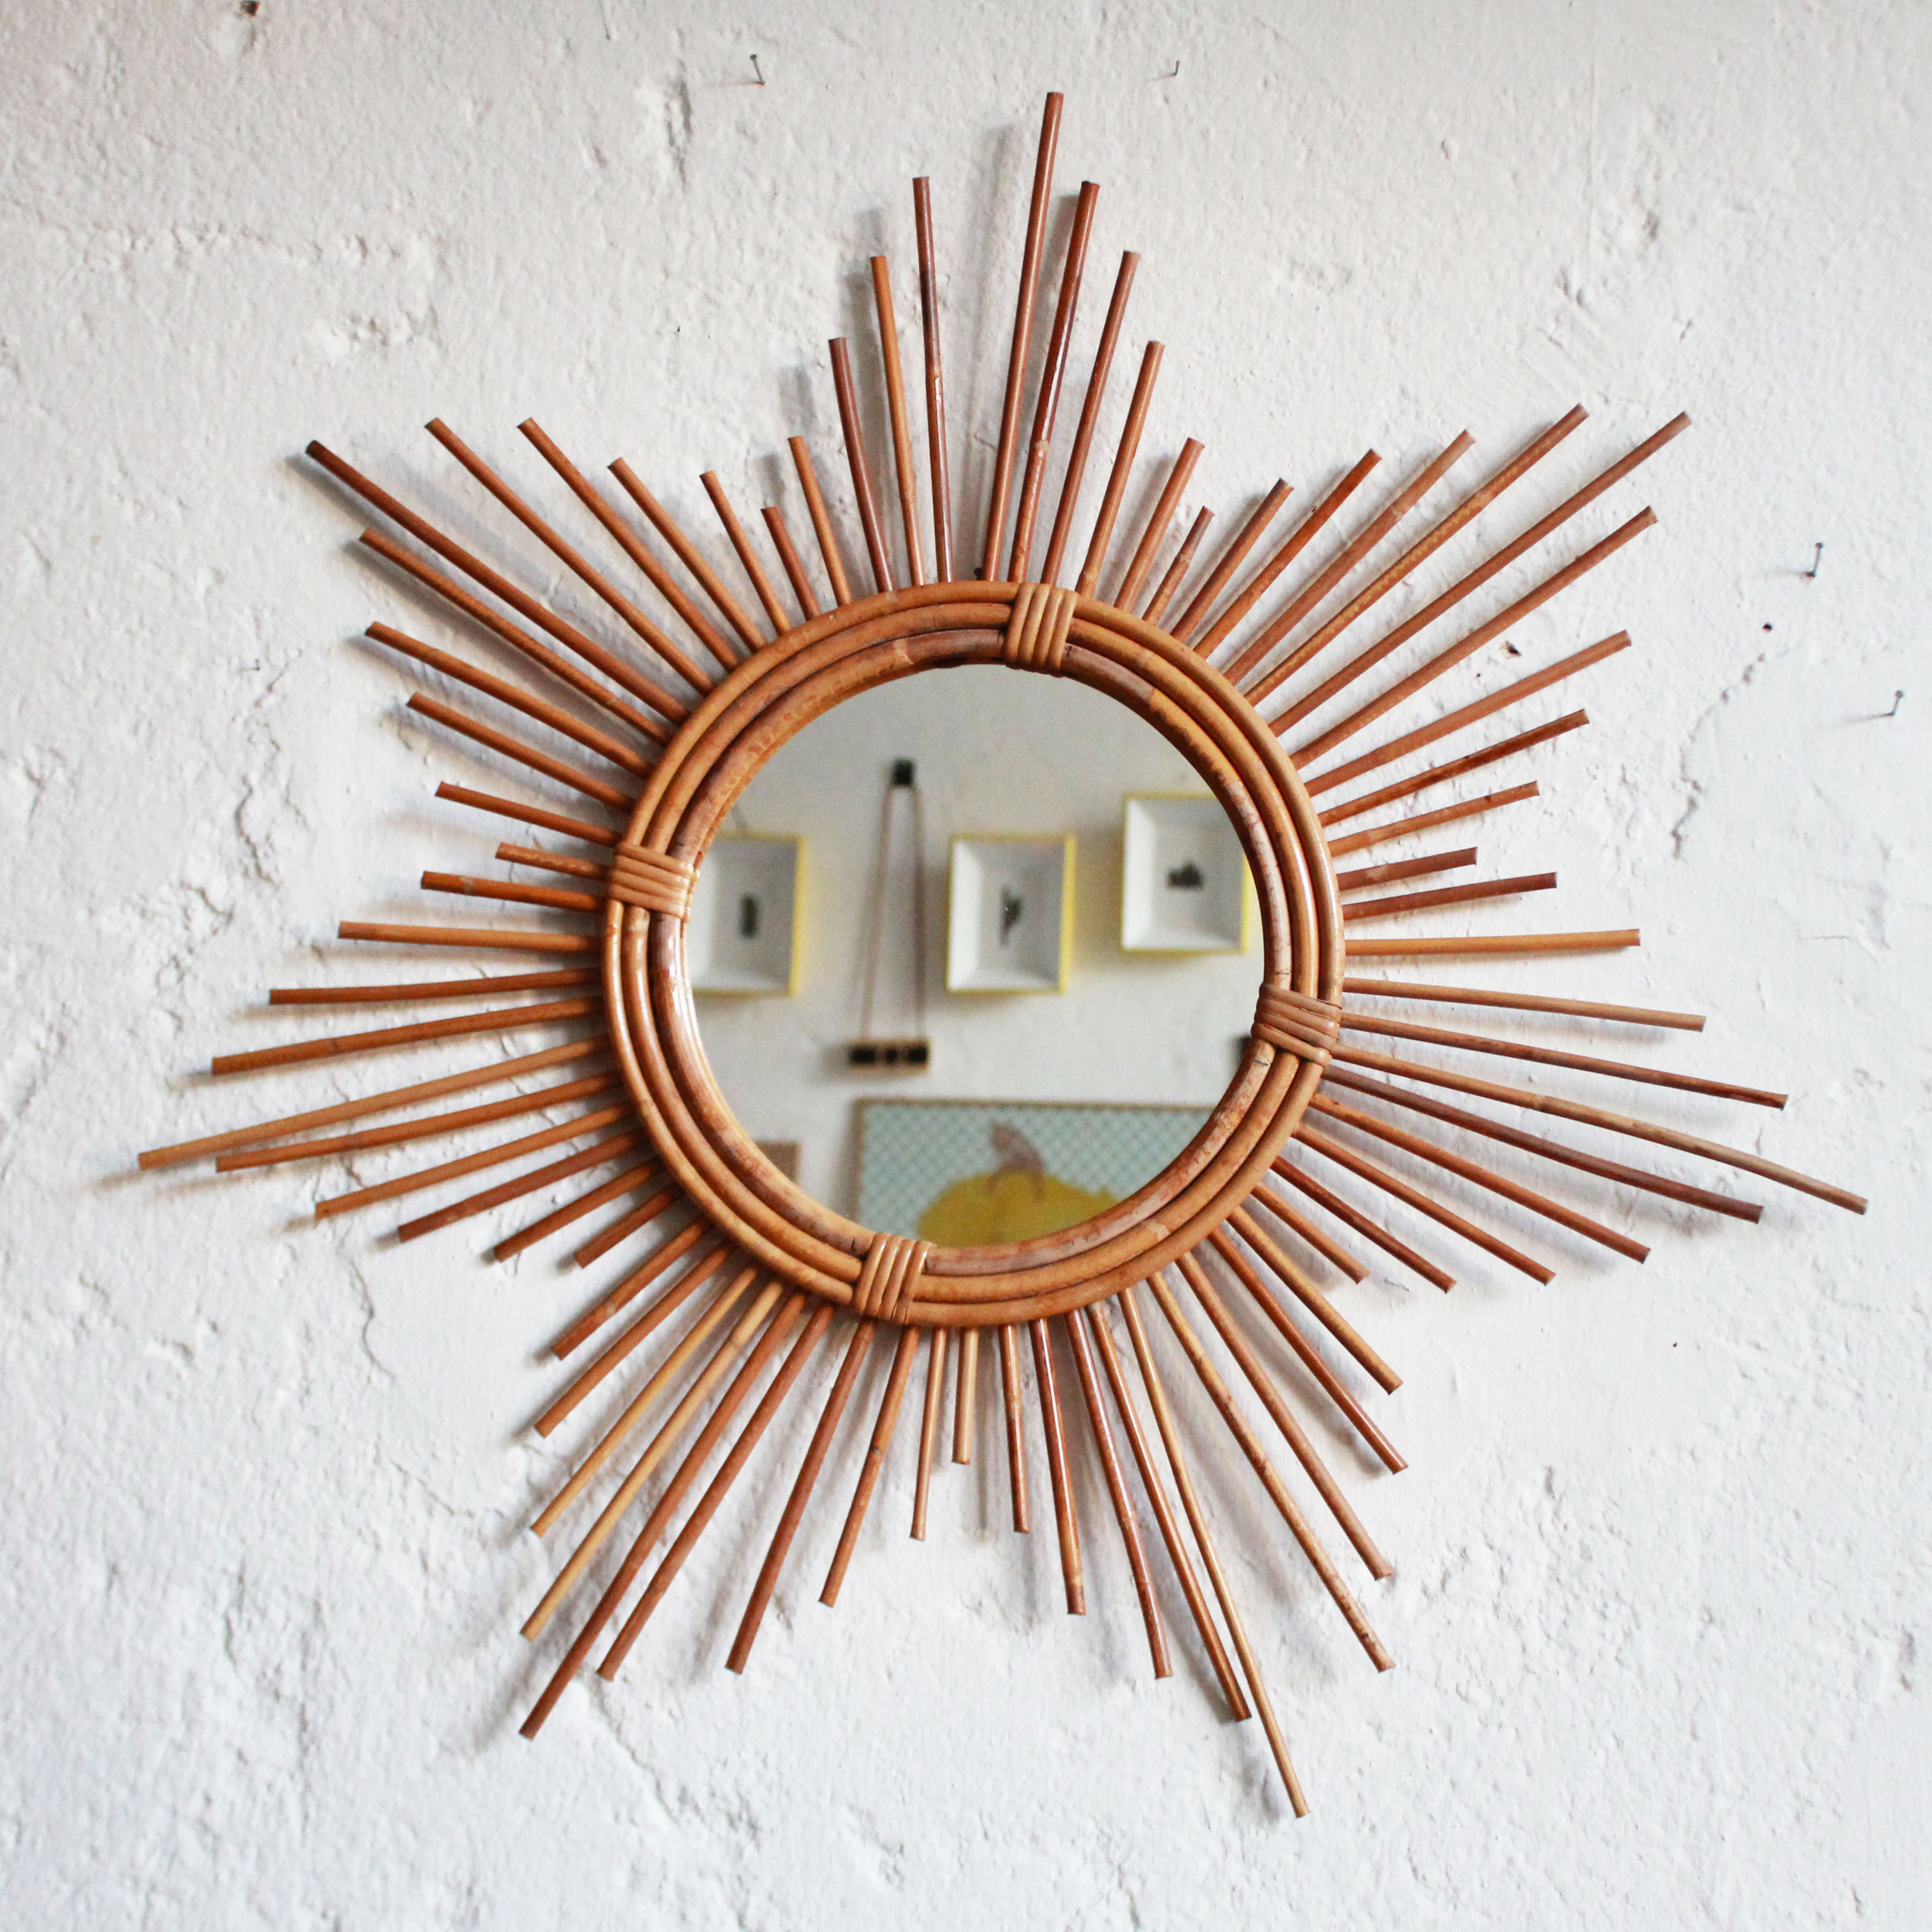 Miroir rotin vintage ann es 50 ann es 60 atelier du petit parc - Miroir en rotin ...